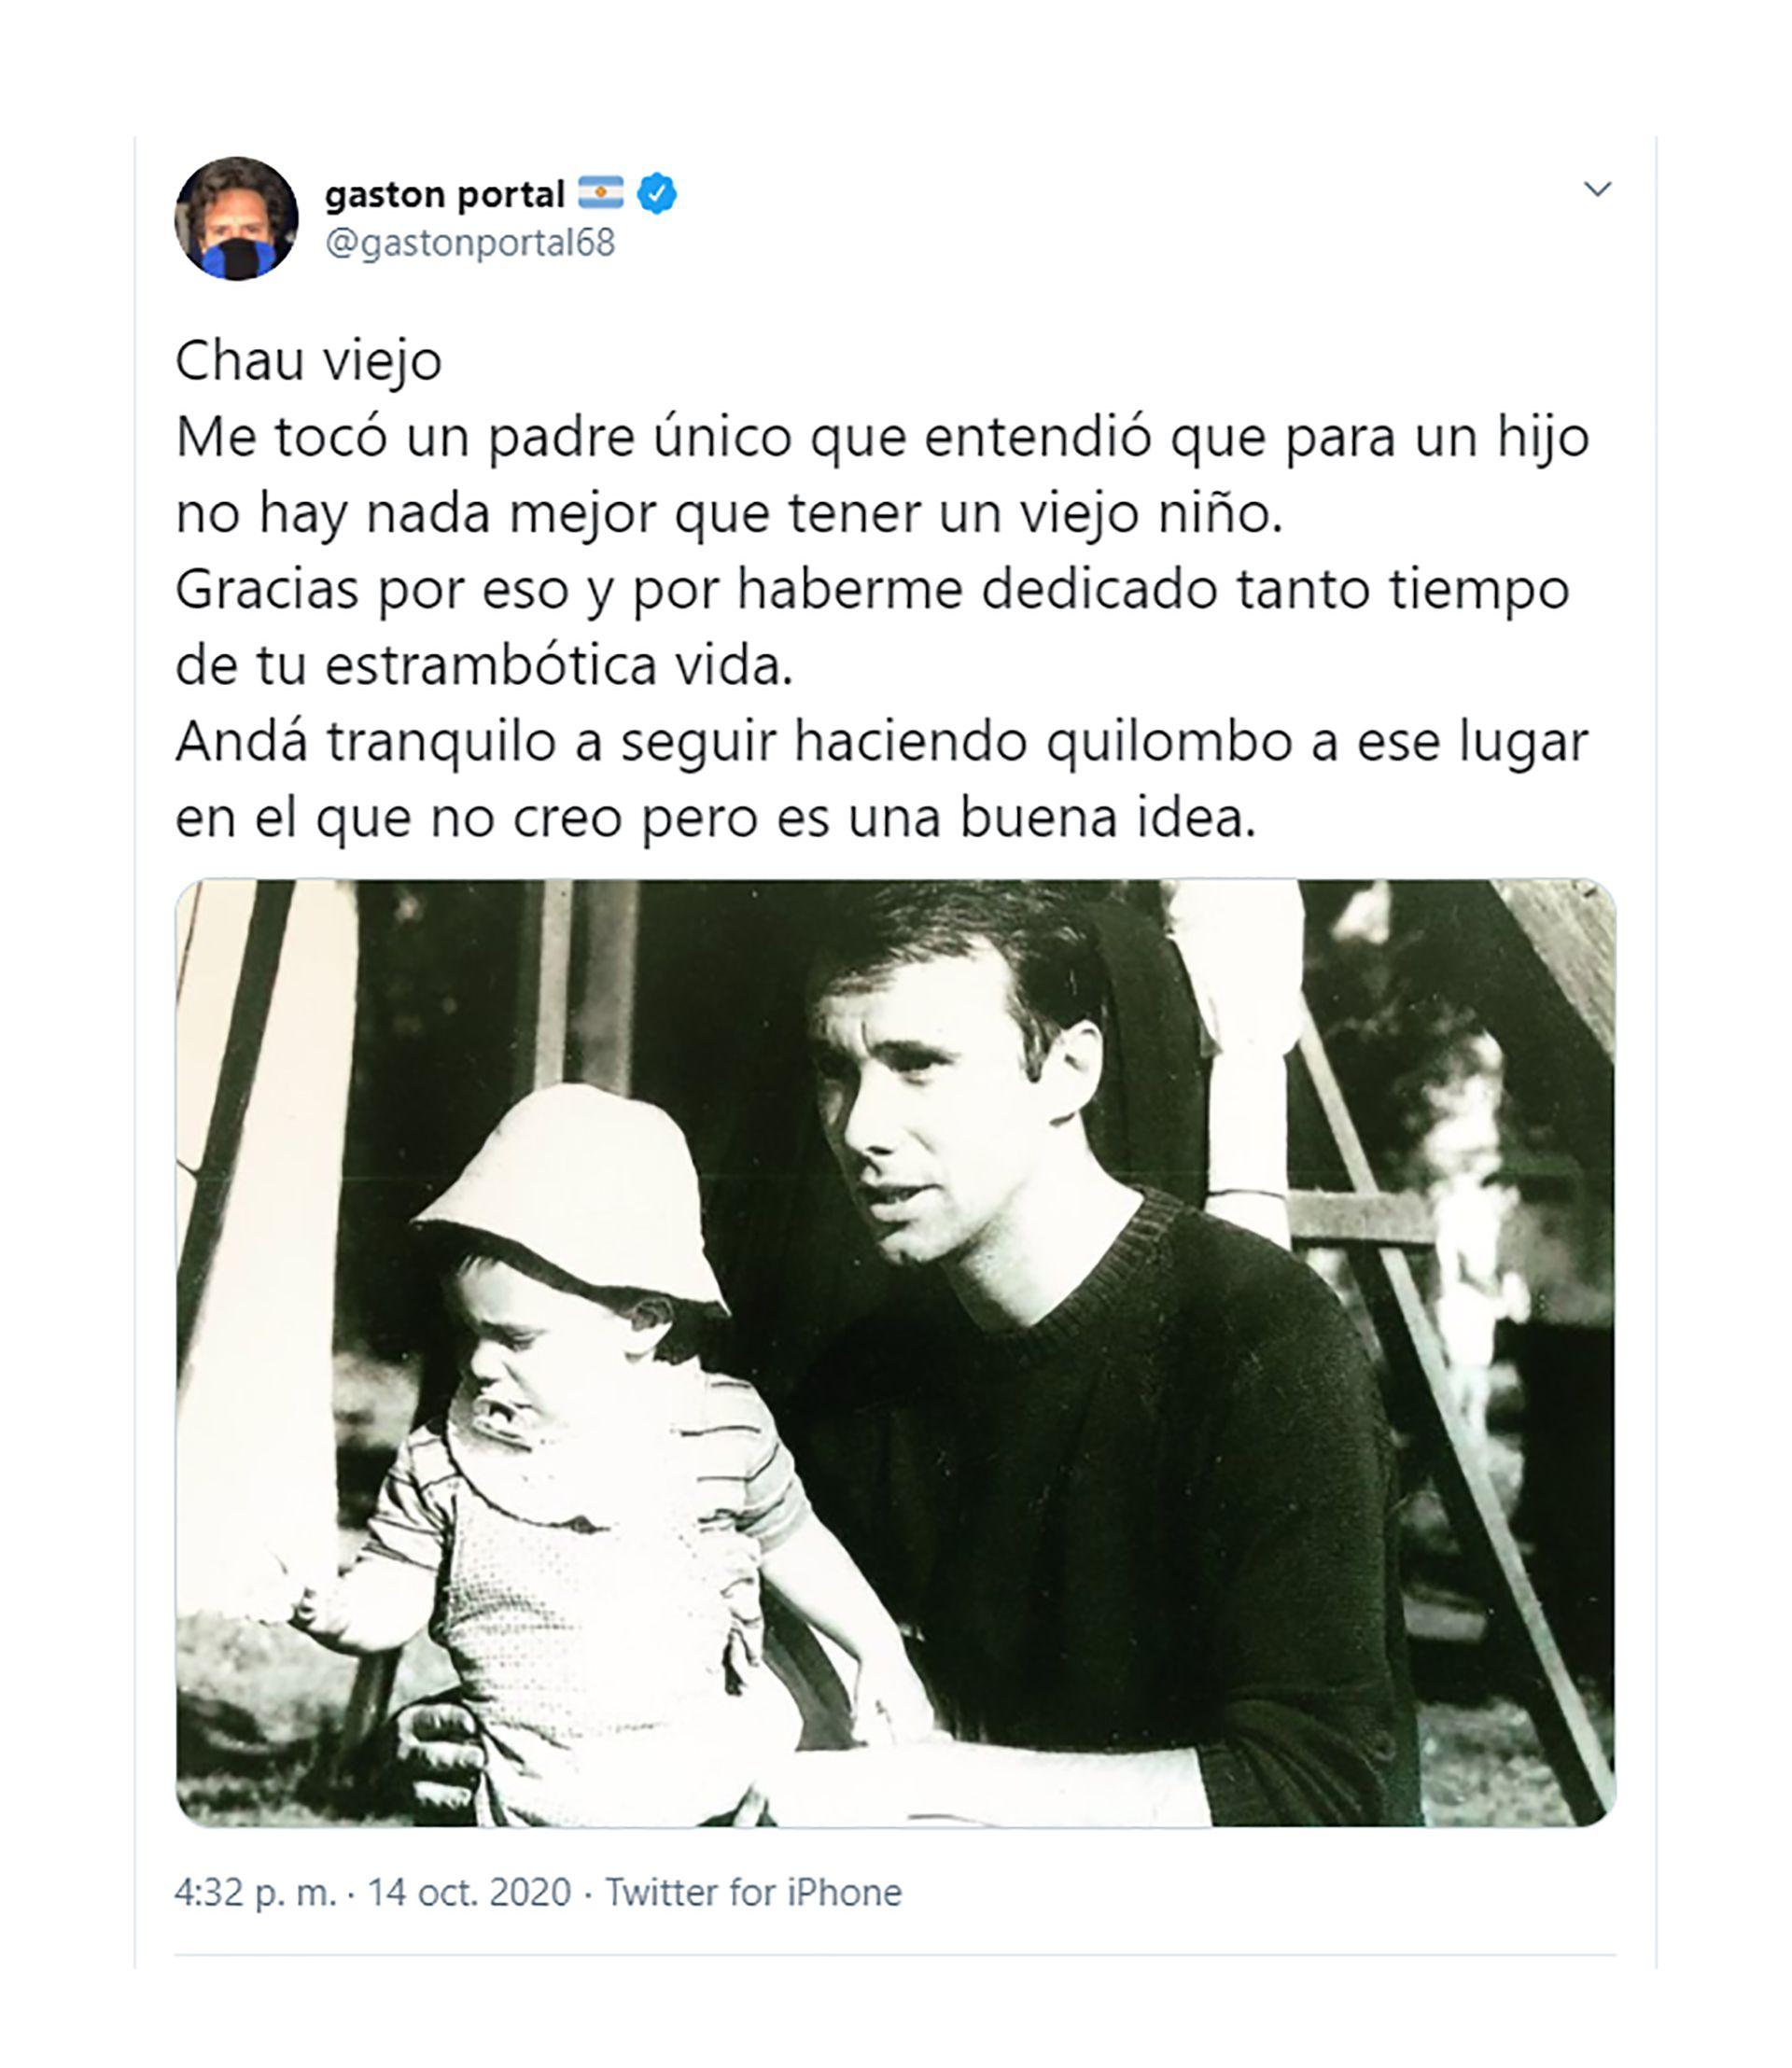 Raúl Portal y Gastón Portal